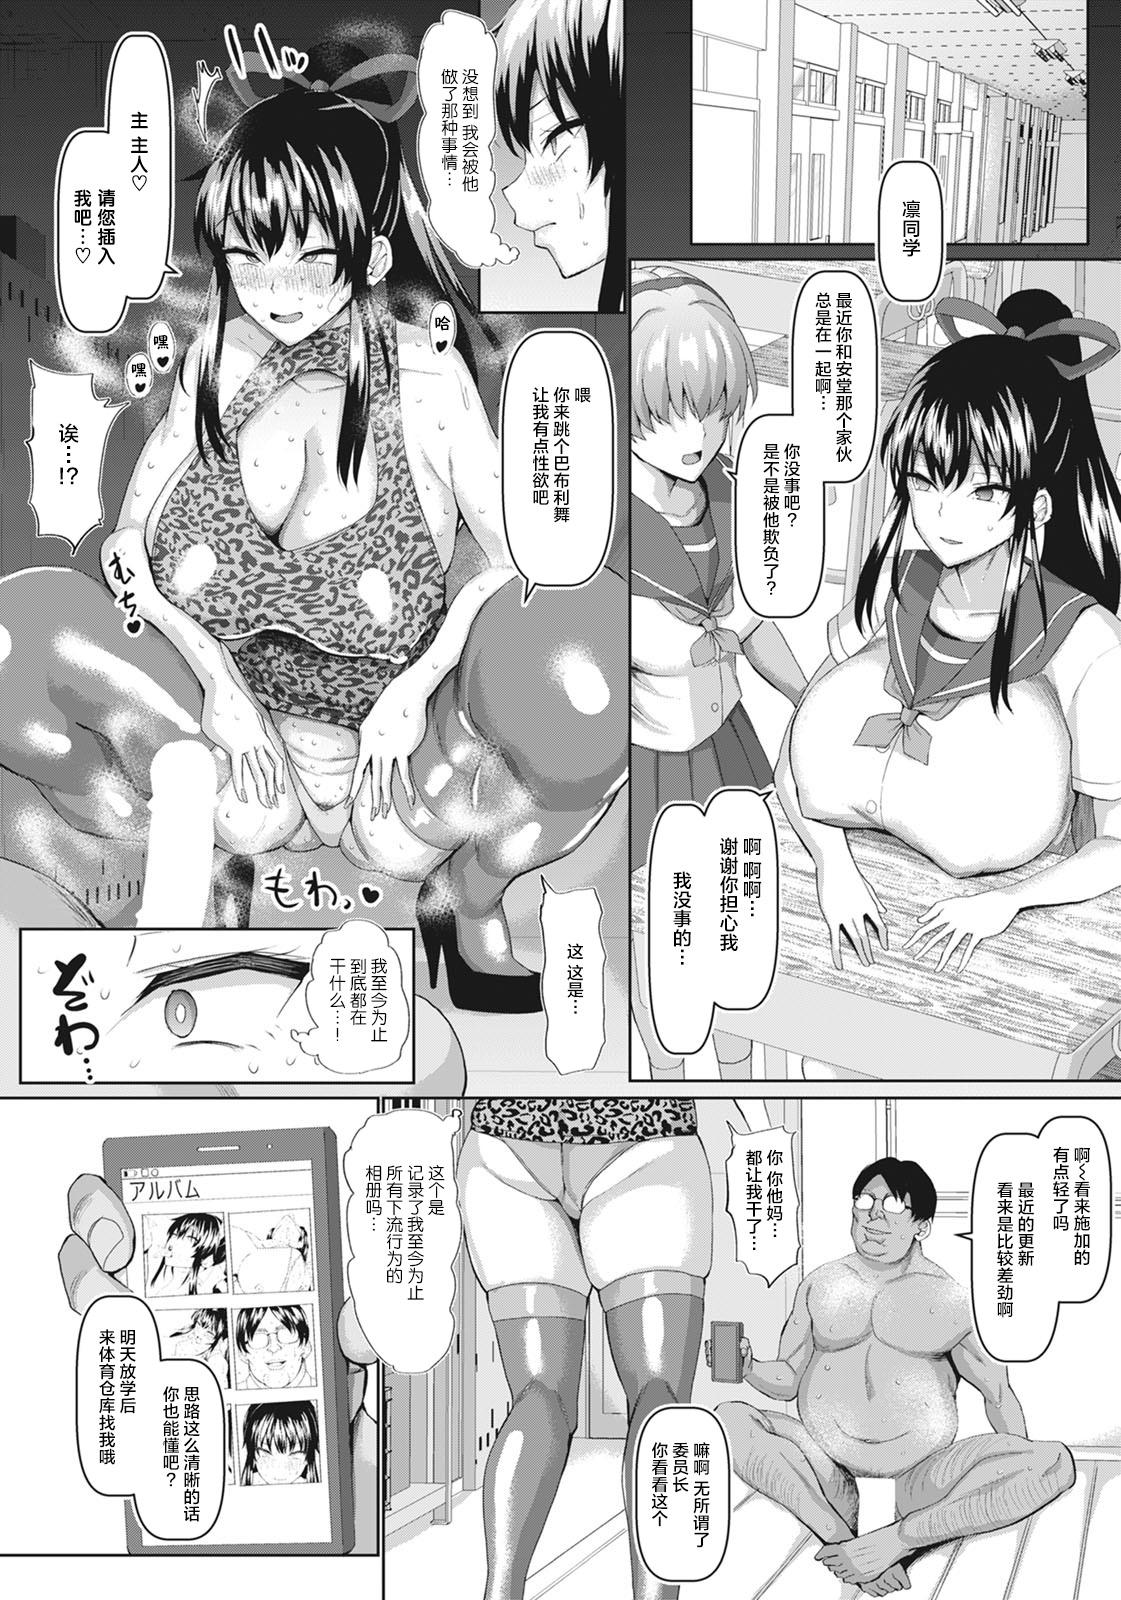 [chin] Fuuki no Midare ni Sennou ga Kikutte Hontou?   I Can Brainwash A Girl Into Violating Public Morals!? (ANGEL Club 2020-11)[Chinese]【不可视汉化】 18